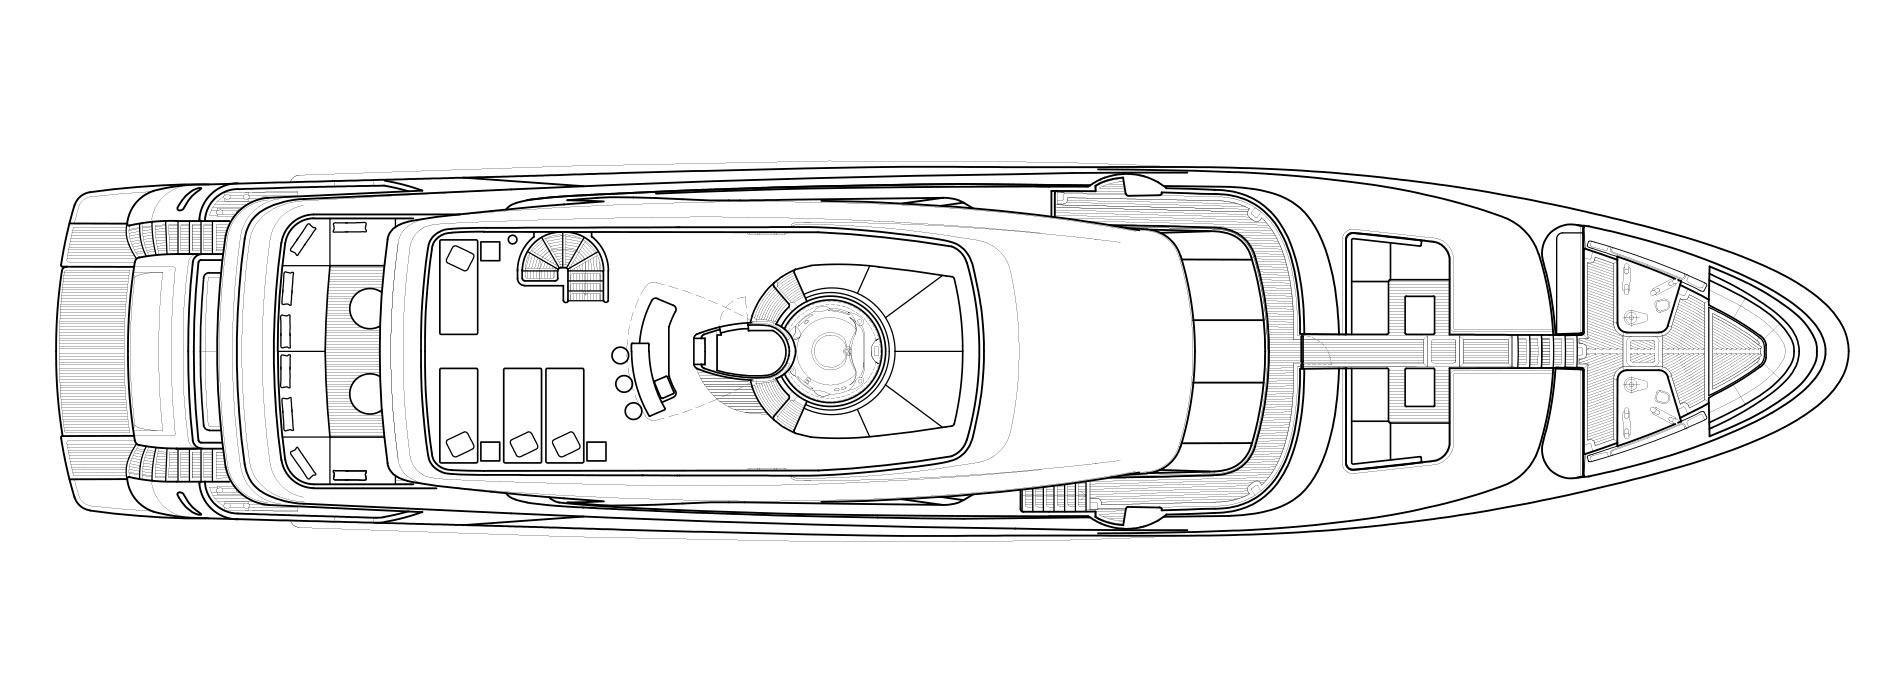 Sanlorenzo Yachts SD126 Flying bridge Version A